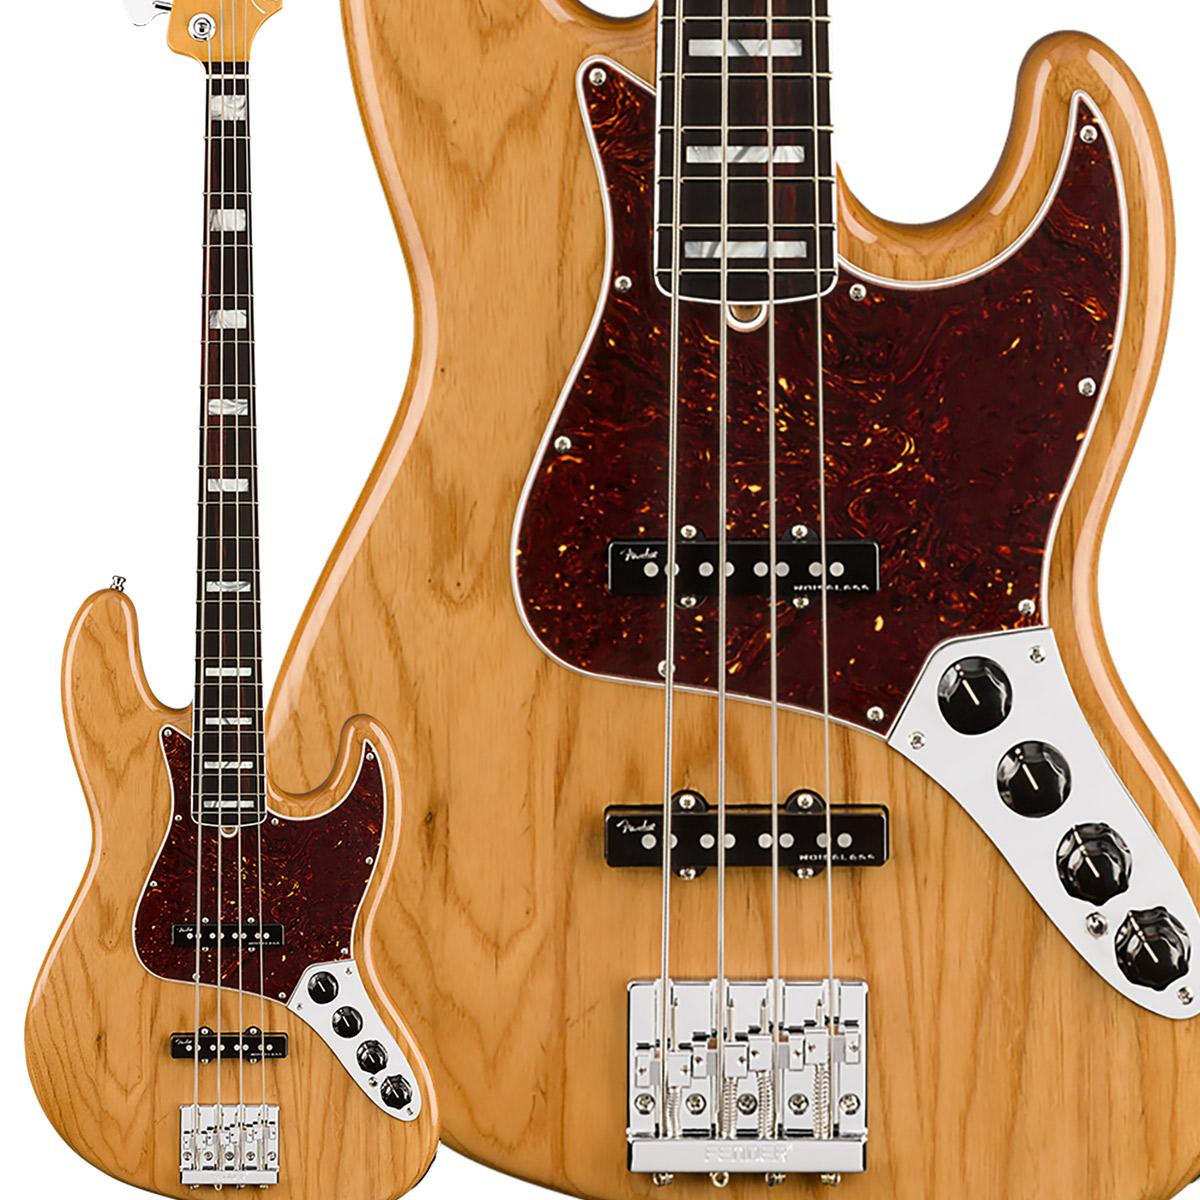 Fender American Ultra Jazz Bass Rosewood Fingerboard Aged Natural ジャズベース 【フェンダー】